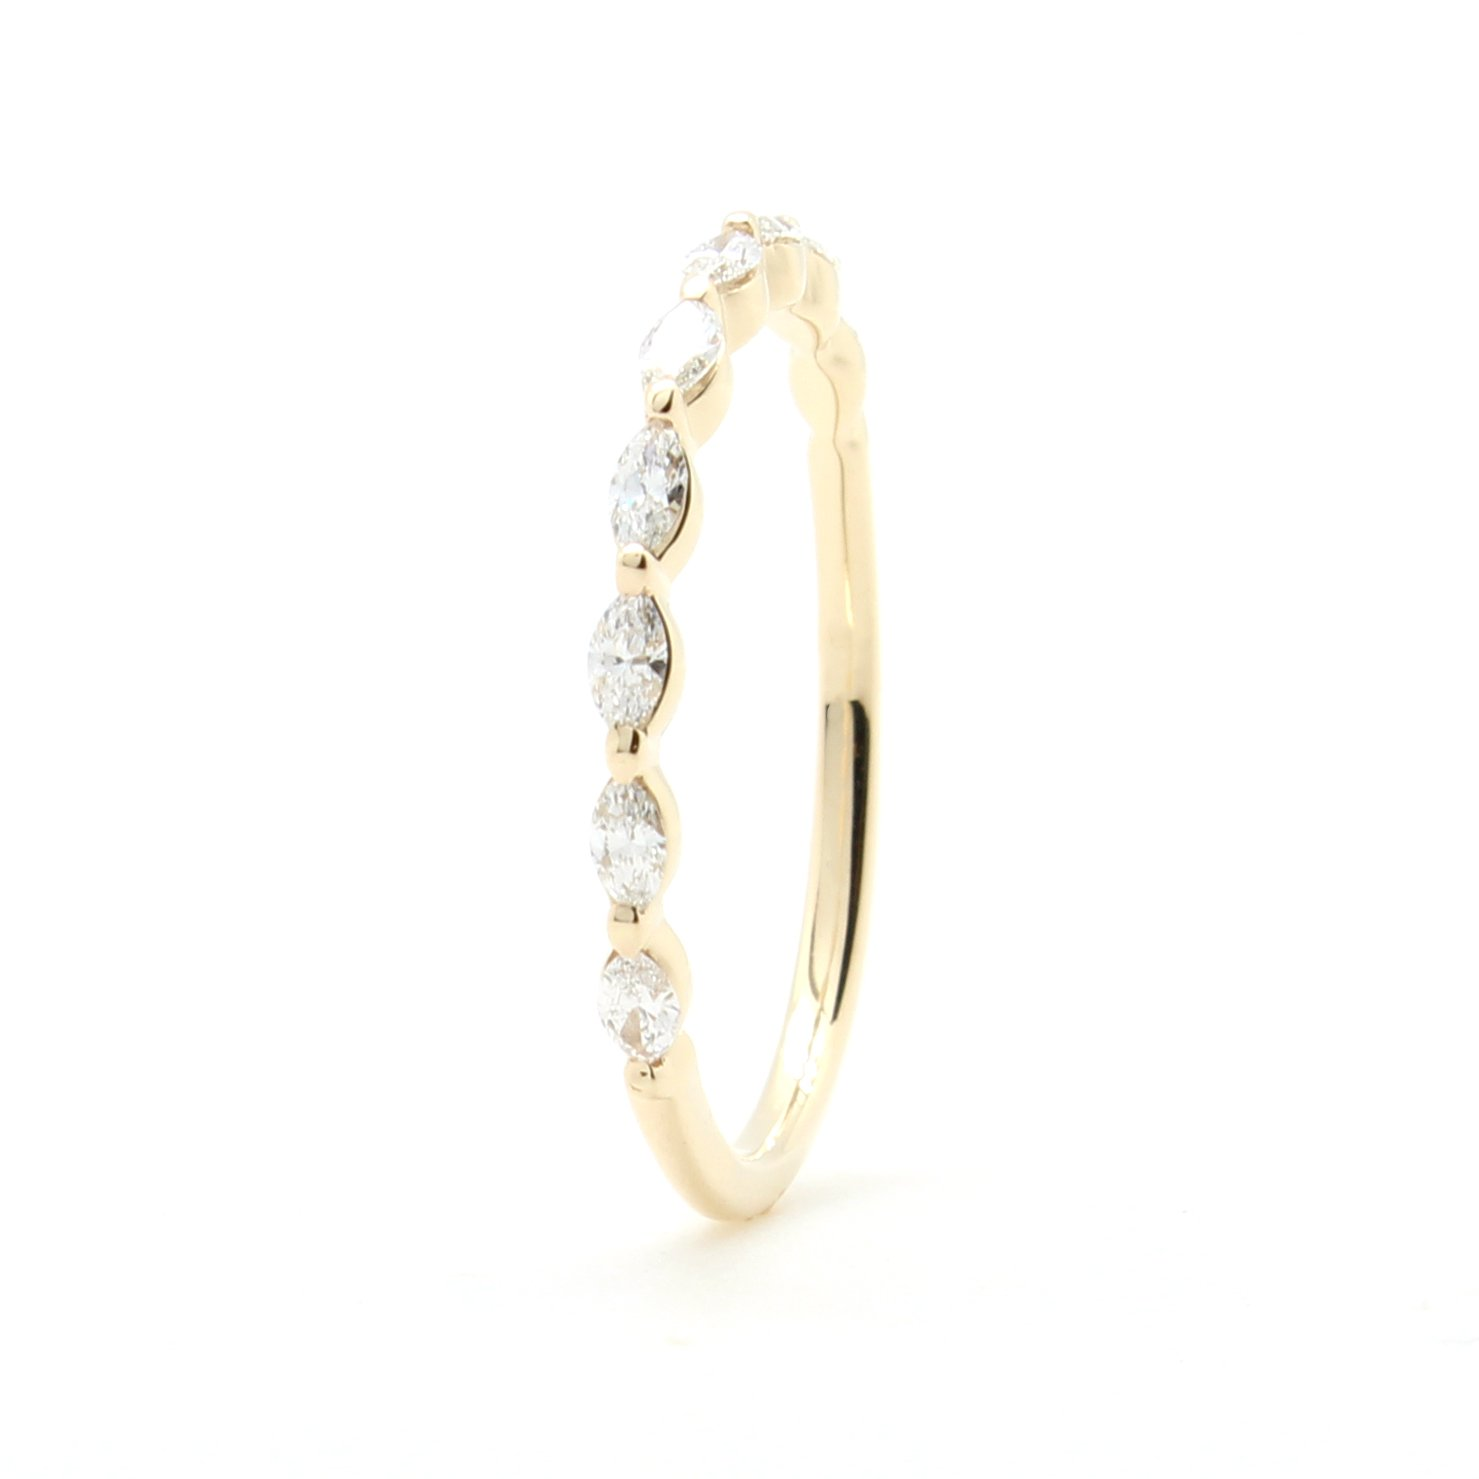 D-H-Jeweler-Marquise-Diamond-Band-2